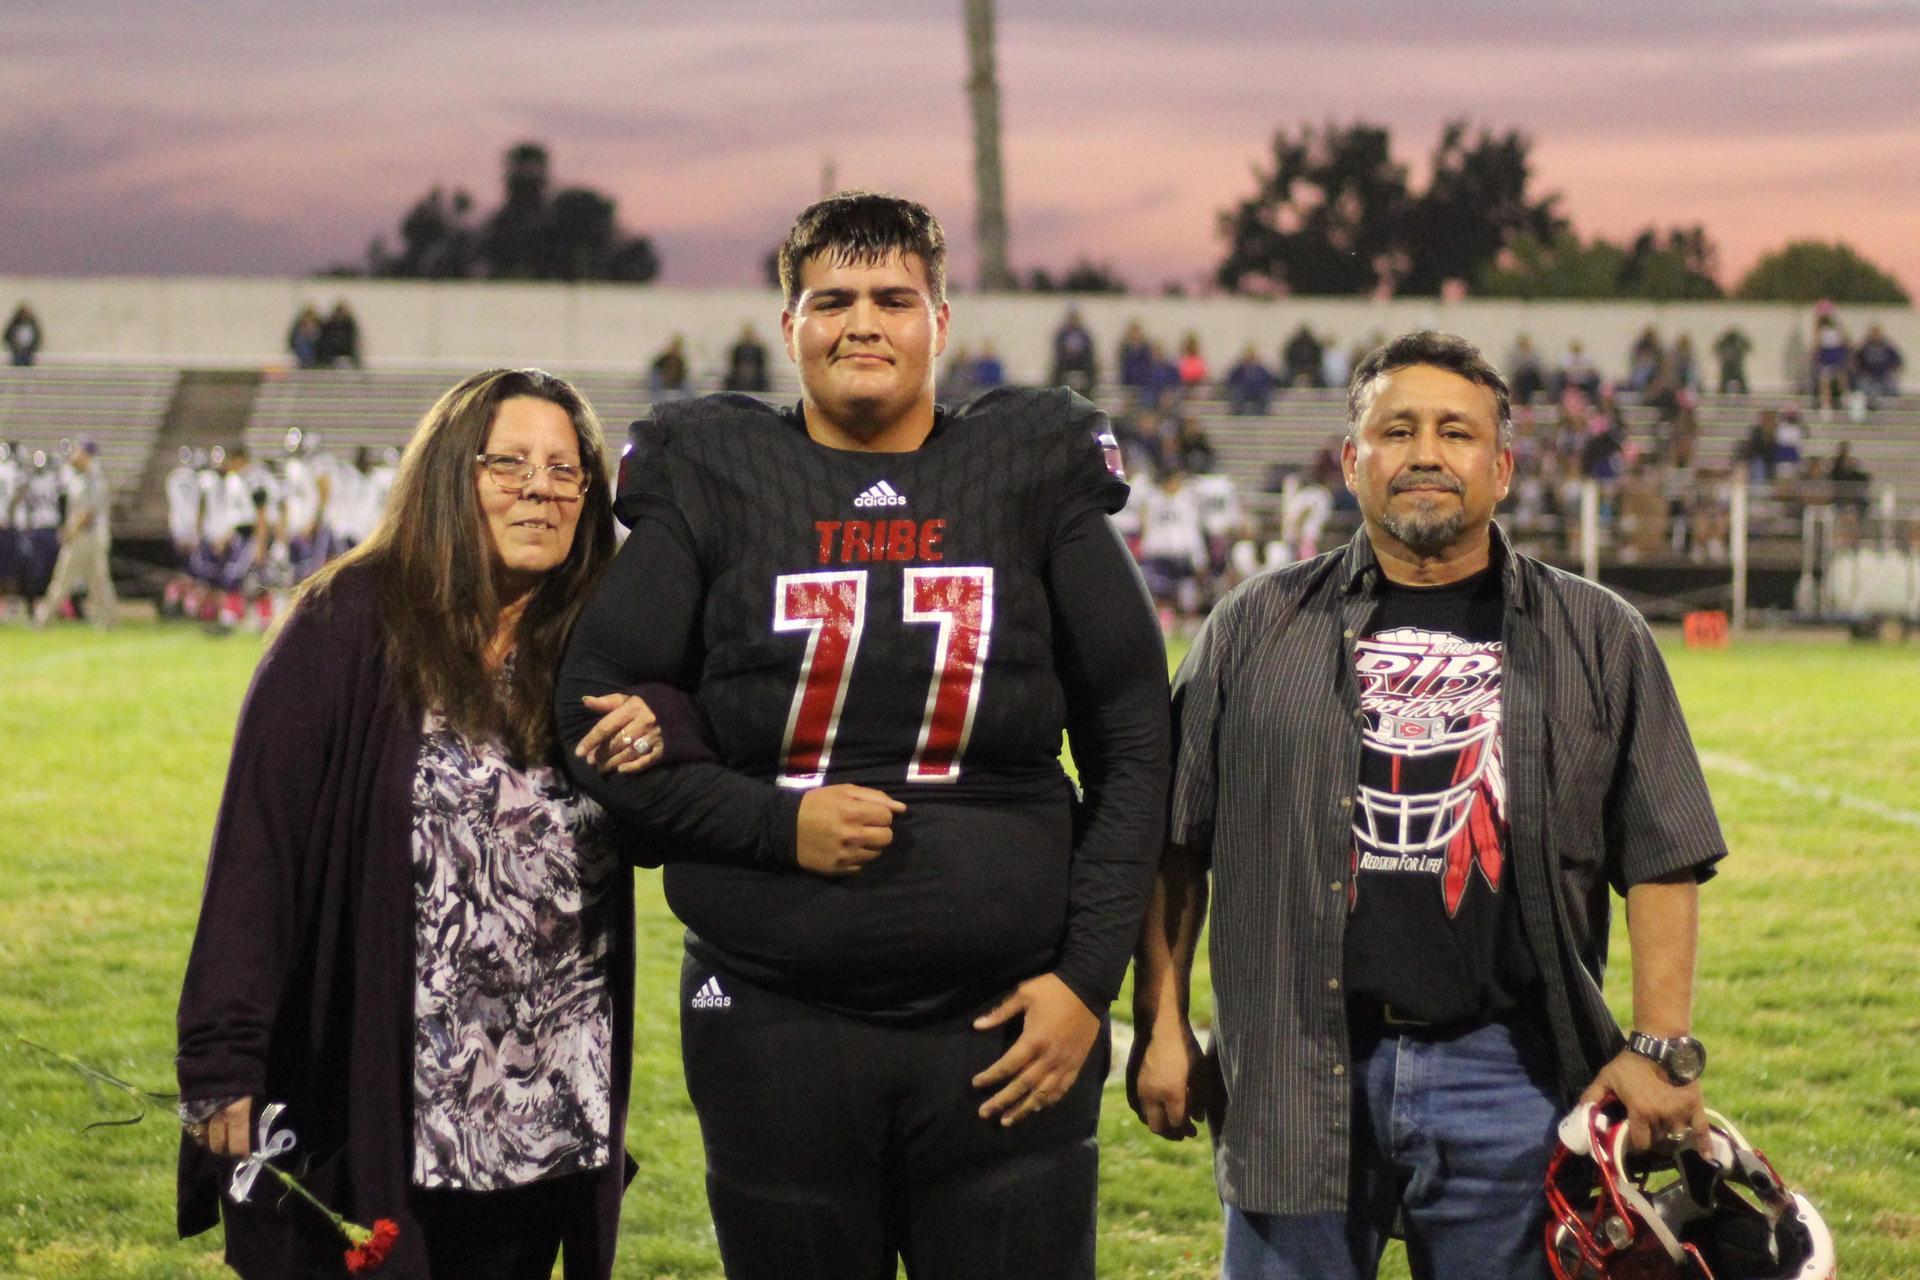 Senior football player Daniel Nieves and his escorts.